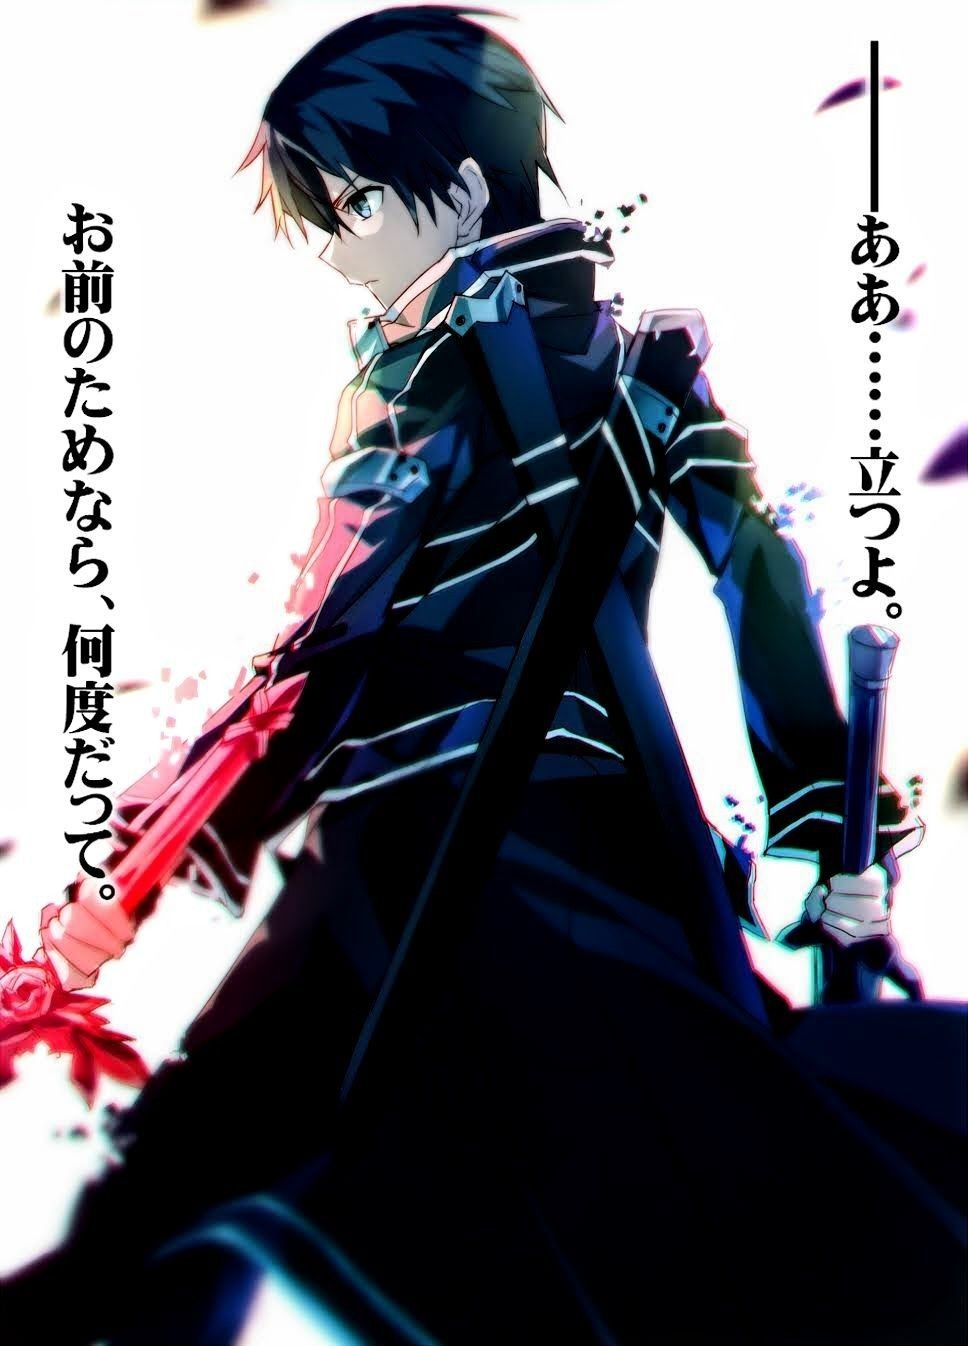 Kirito Swordartonline Sao Fanart Anime Personagens De Anime Menina Anime Animes Wallpapers